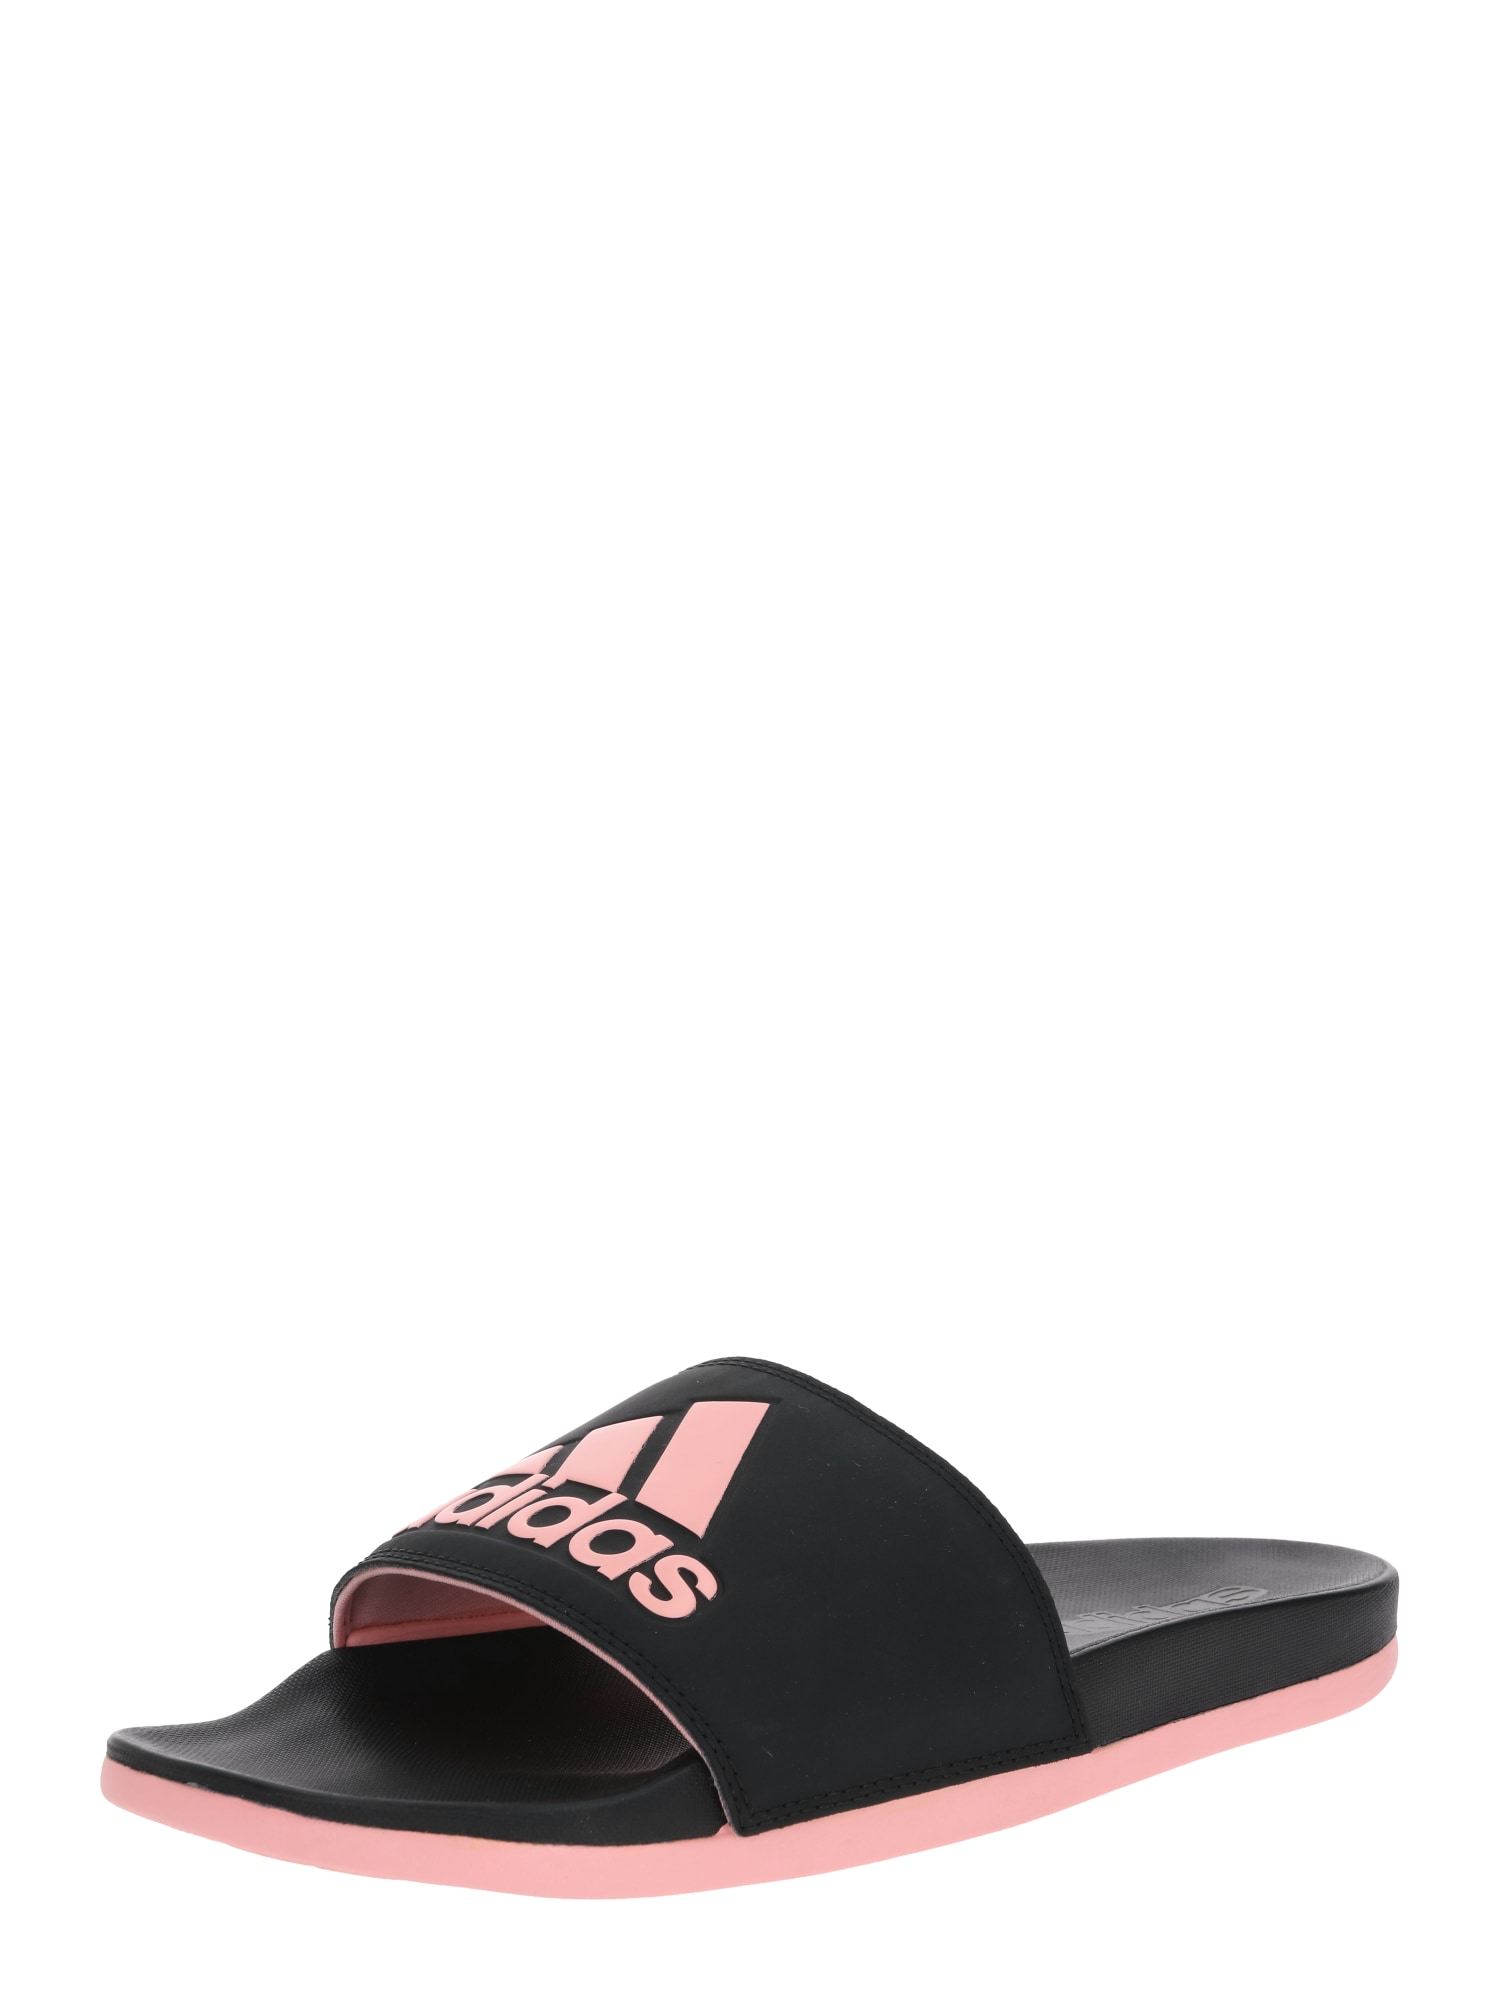 ADIDAS PERFORMANCE Flip-flops  negru / roz deschis